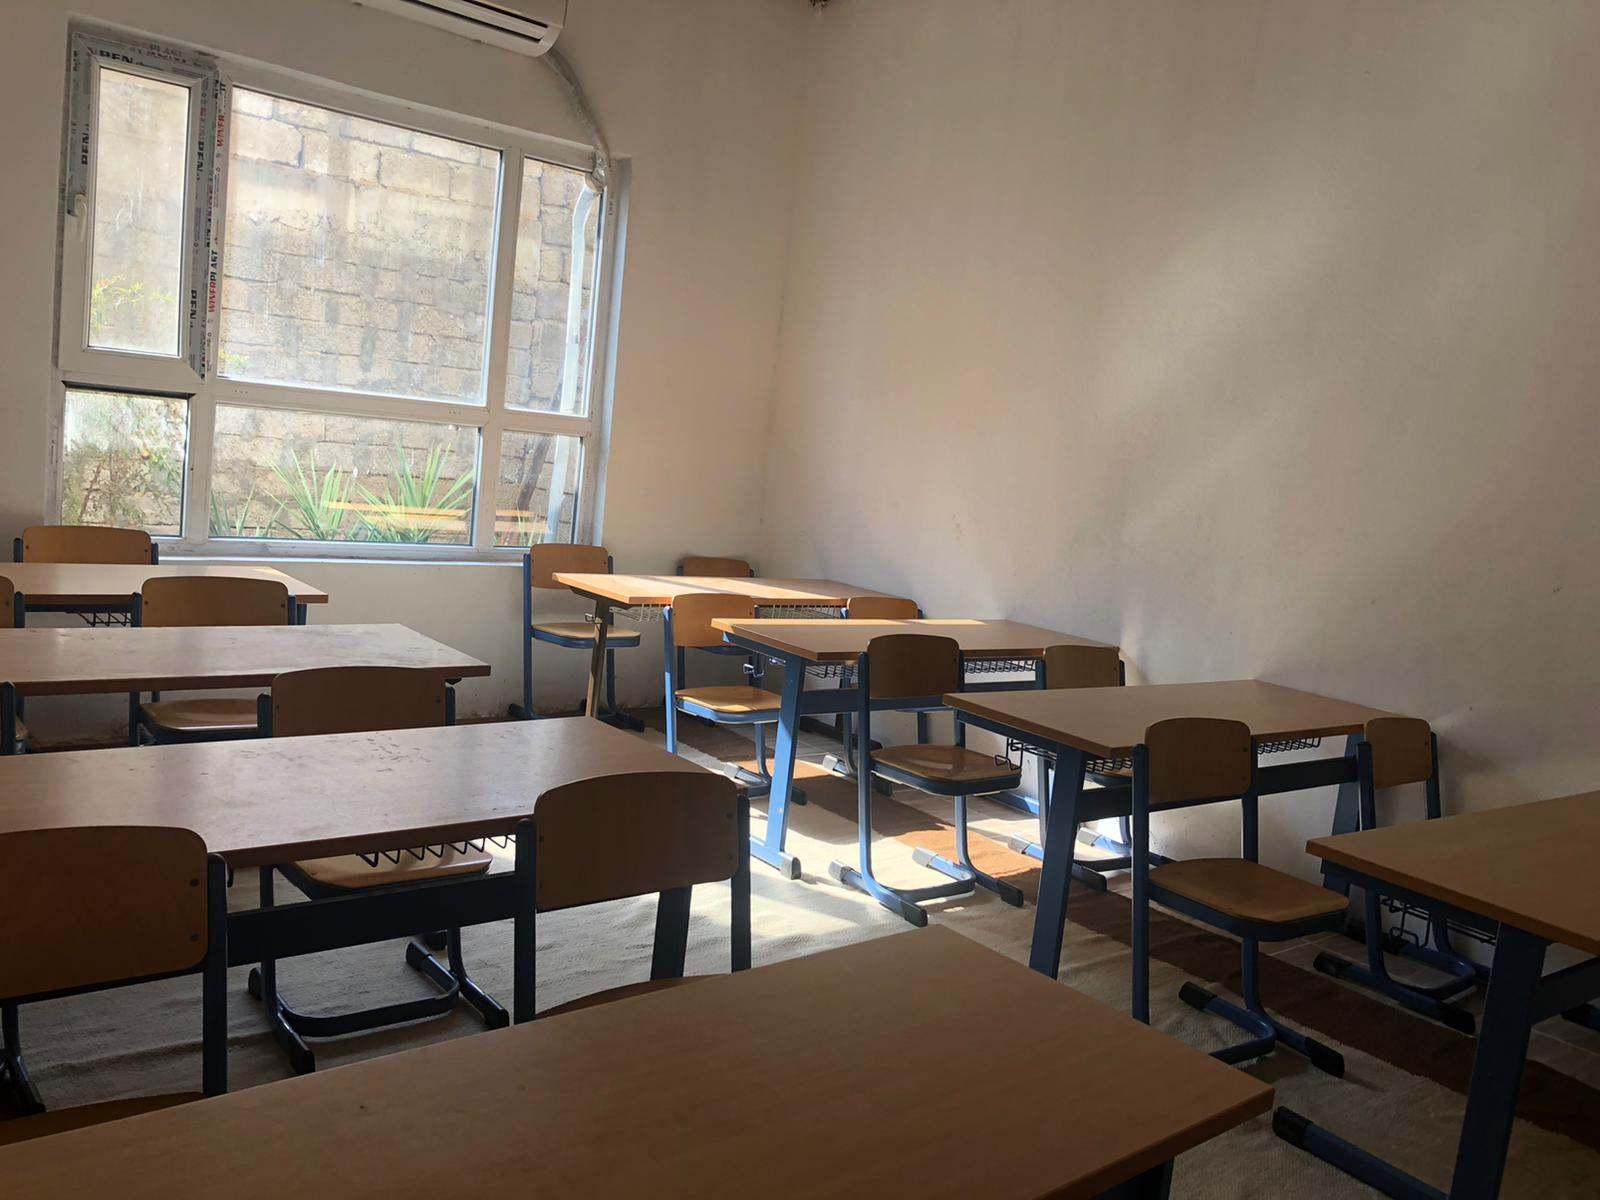 erste Klassenraum steht